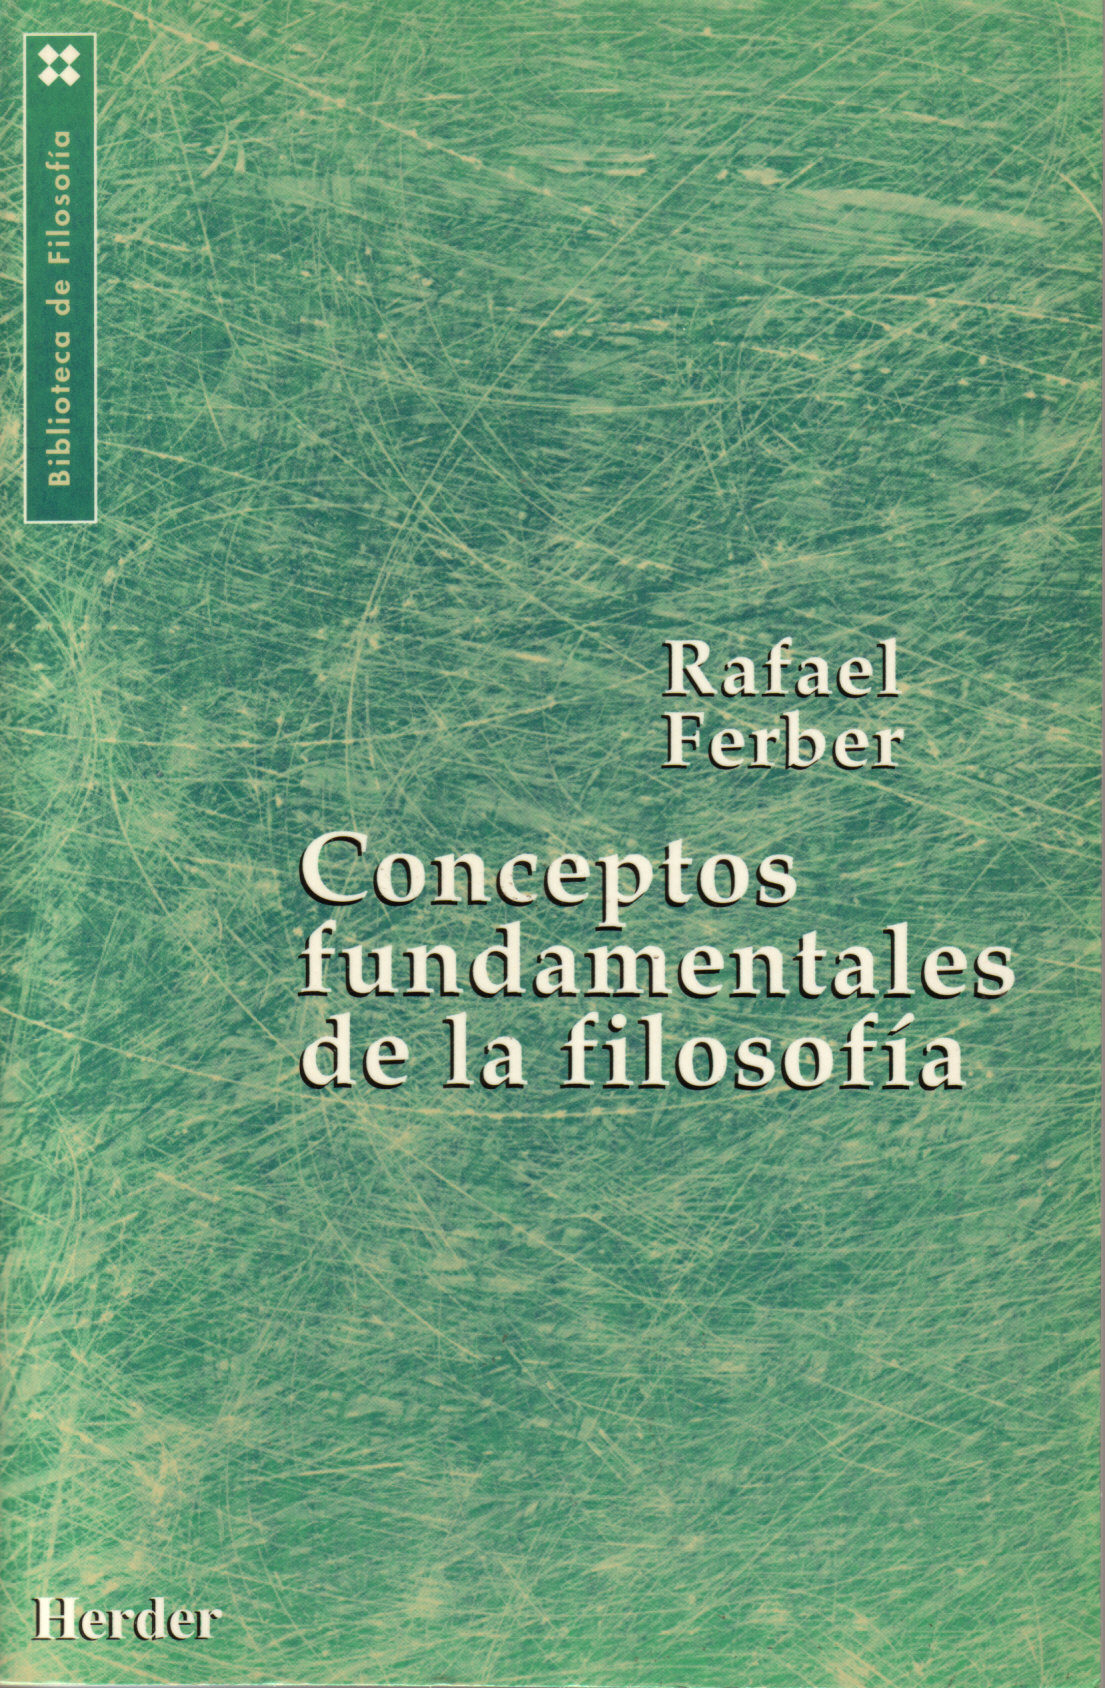 conceptos fundamentales de la filosofia-rafael ferber-9788425419300